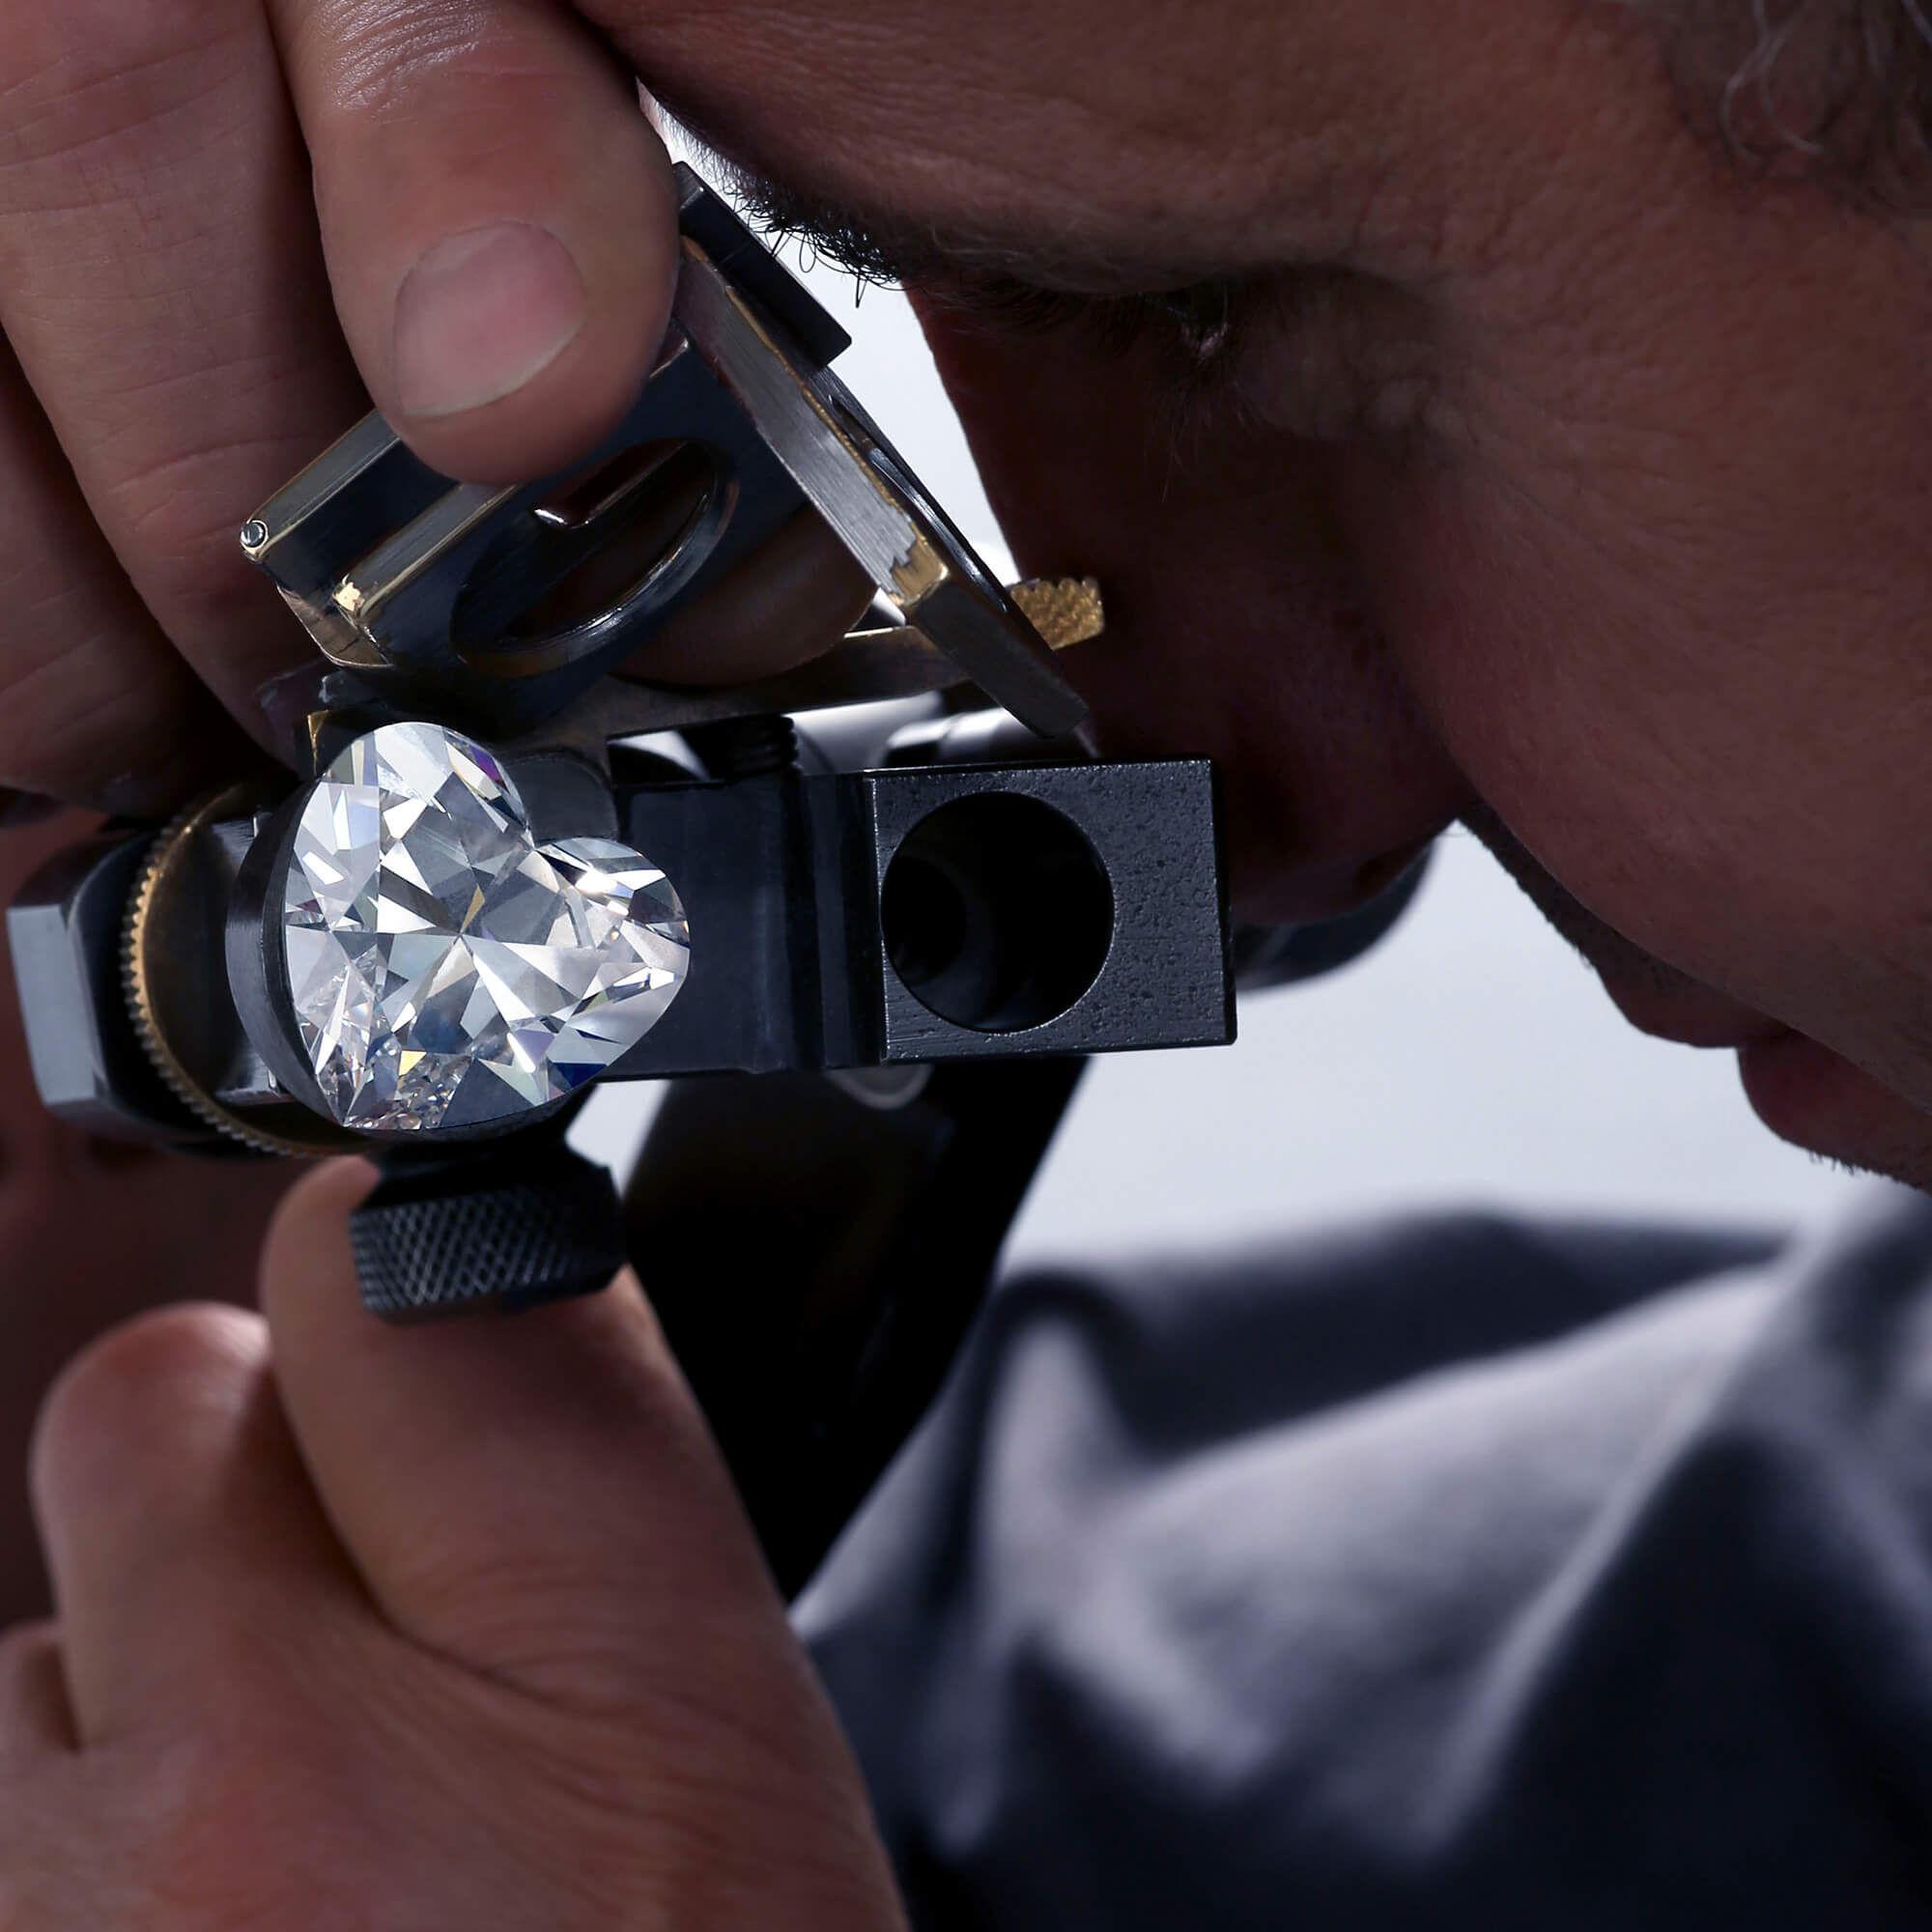 A Graff member looking into the Venus diamond through a loupe